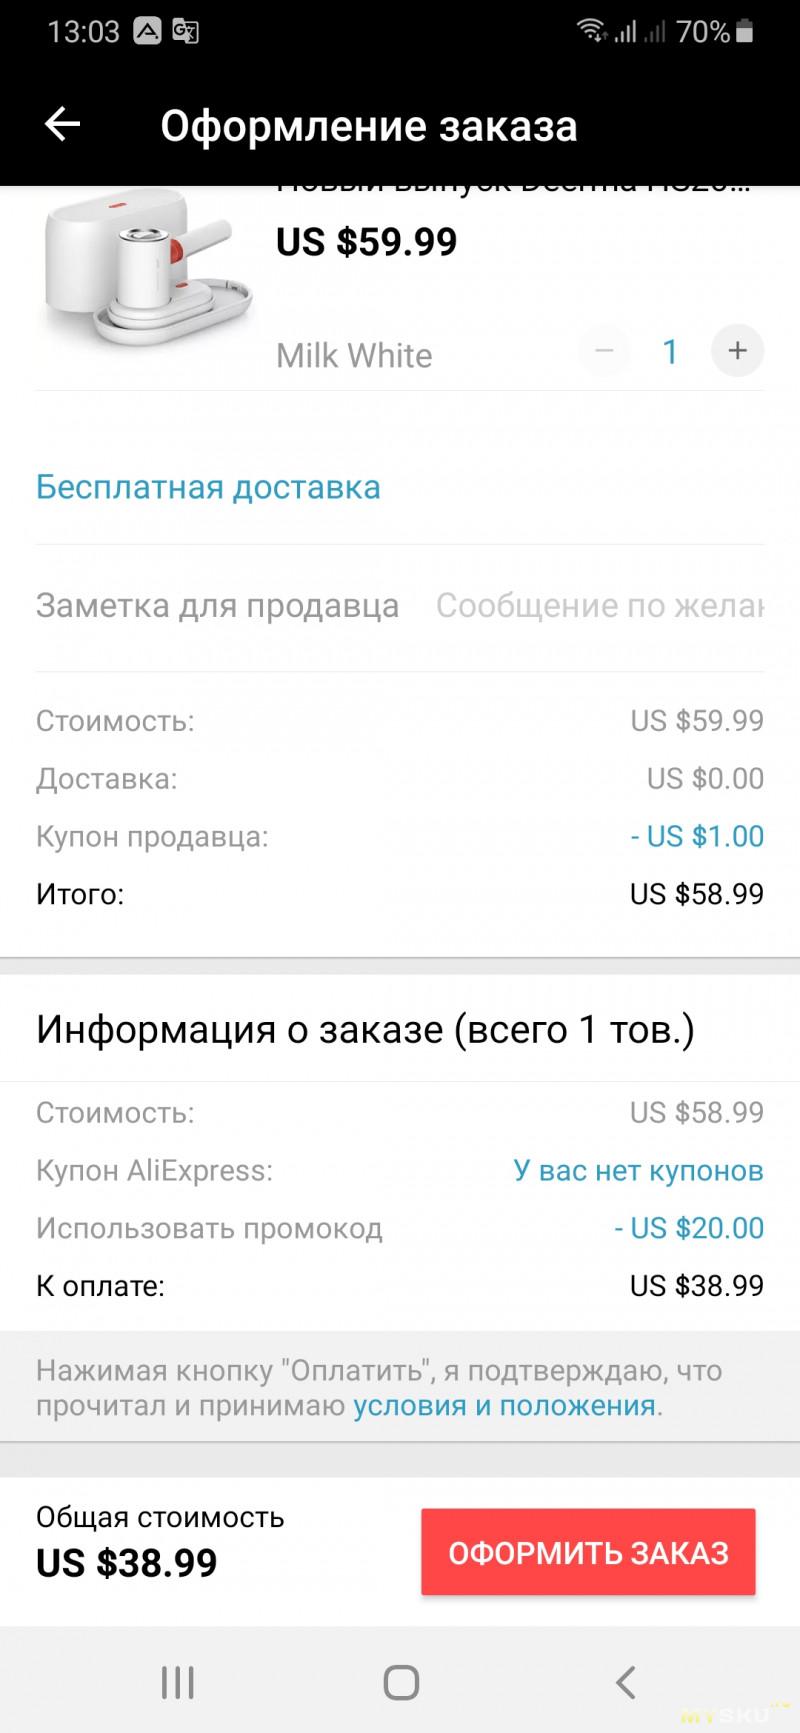 Новинка отпариватель/утюг Deerma HS200 за 38.99$